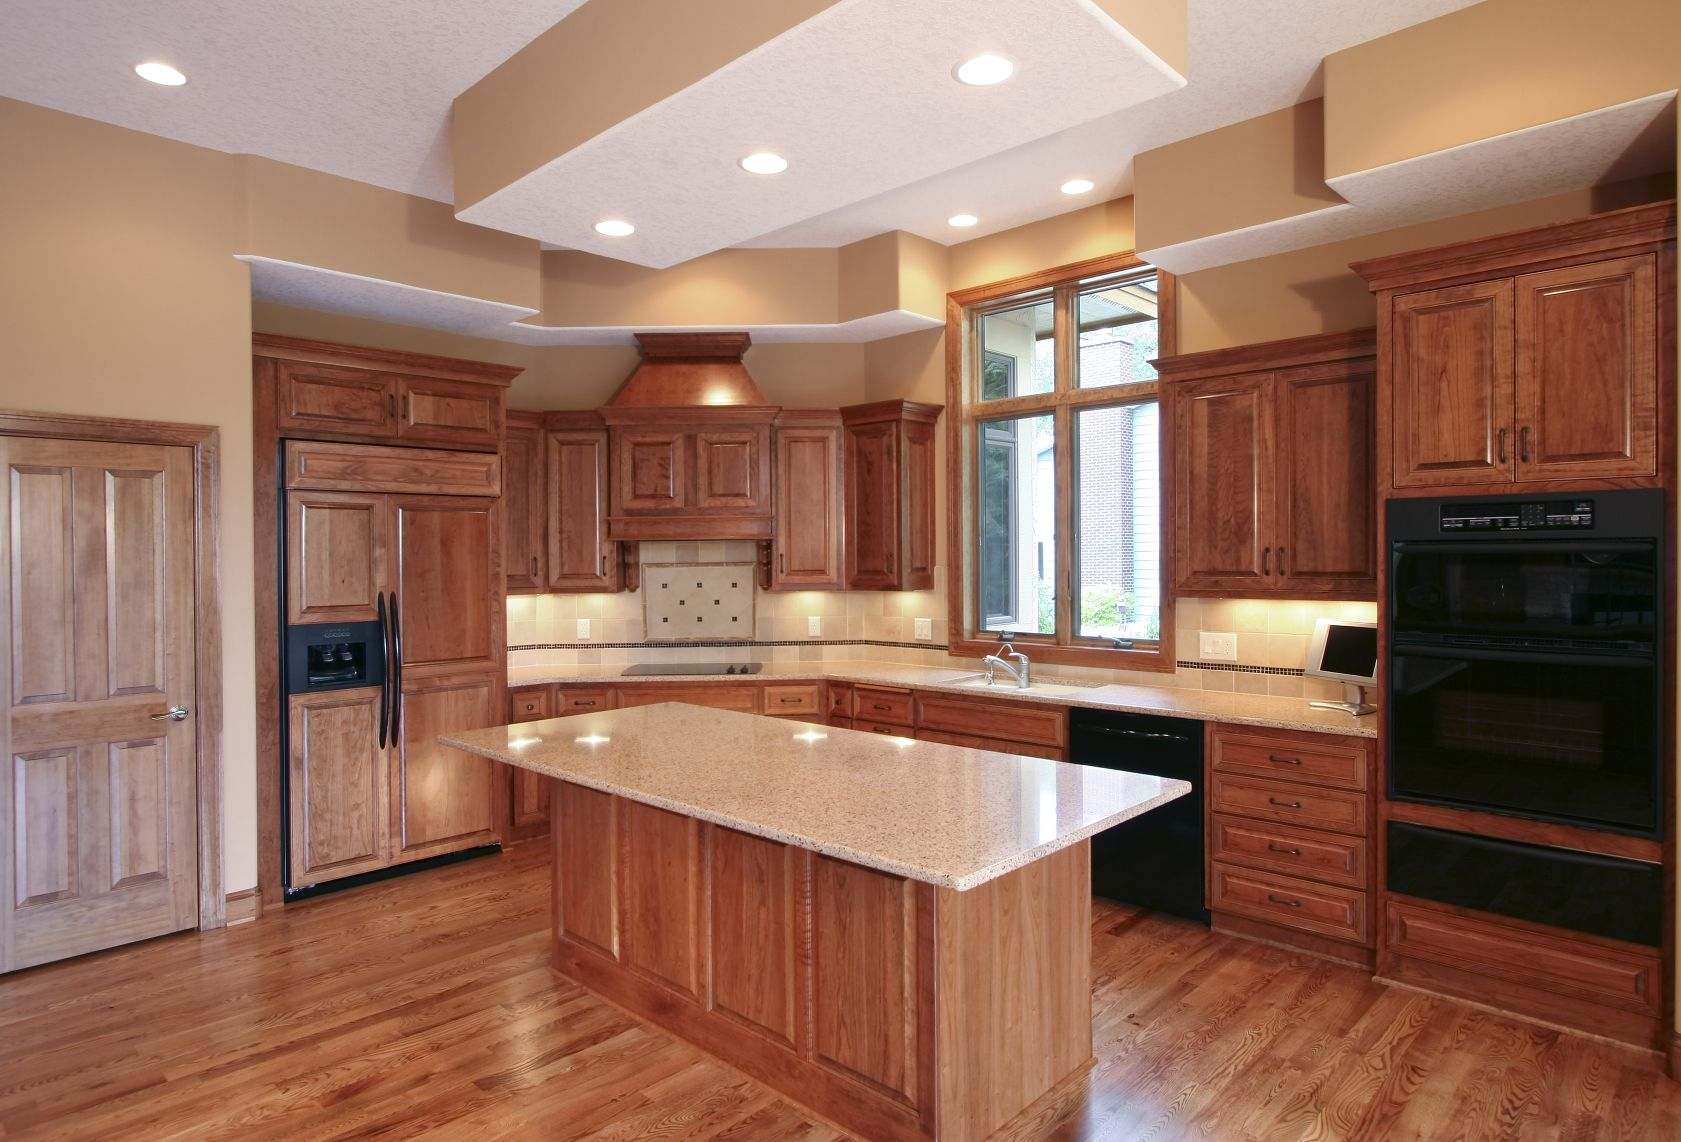 101 Custom Kitchen Design Ideas Pictures Black Appliances Kitchen Black Appliances Cherry Cabinets Kitchen